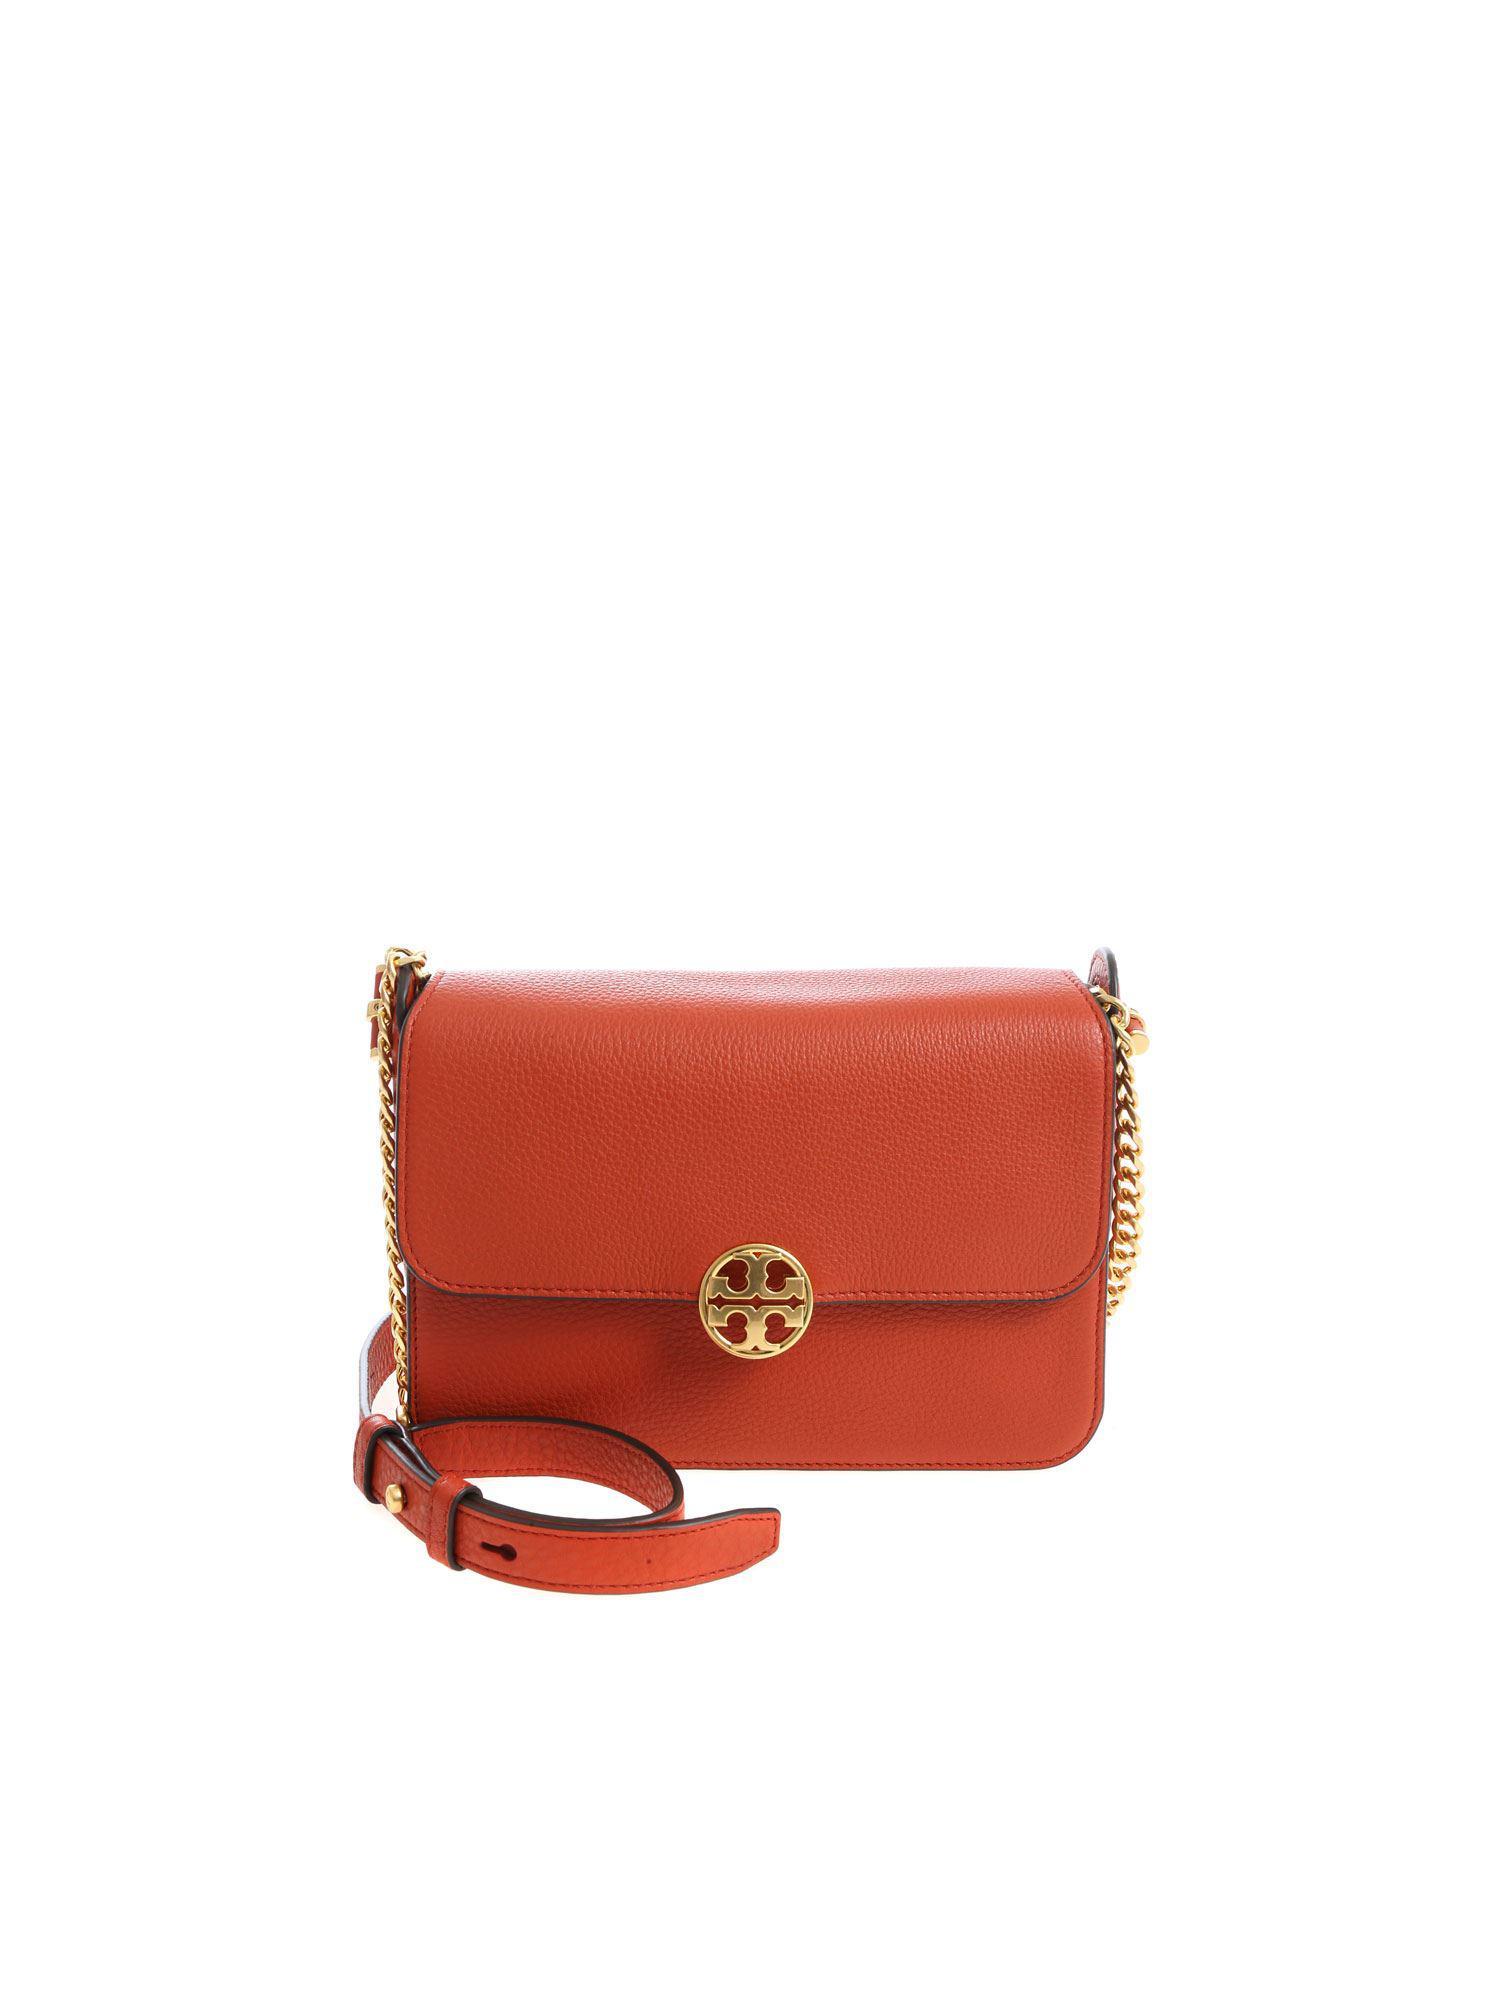 42194317b12 Tory Burch Orange Shoulder Bag With Logo in Orange - Lyst